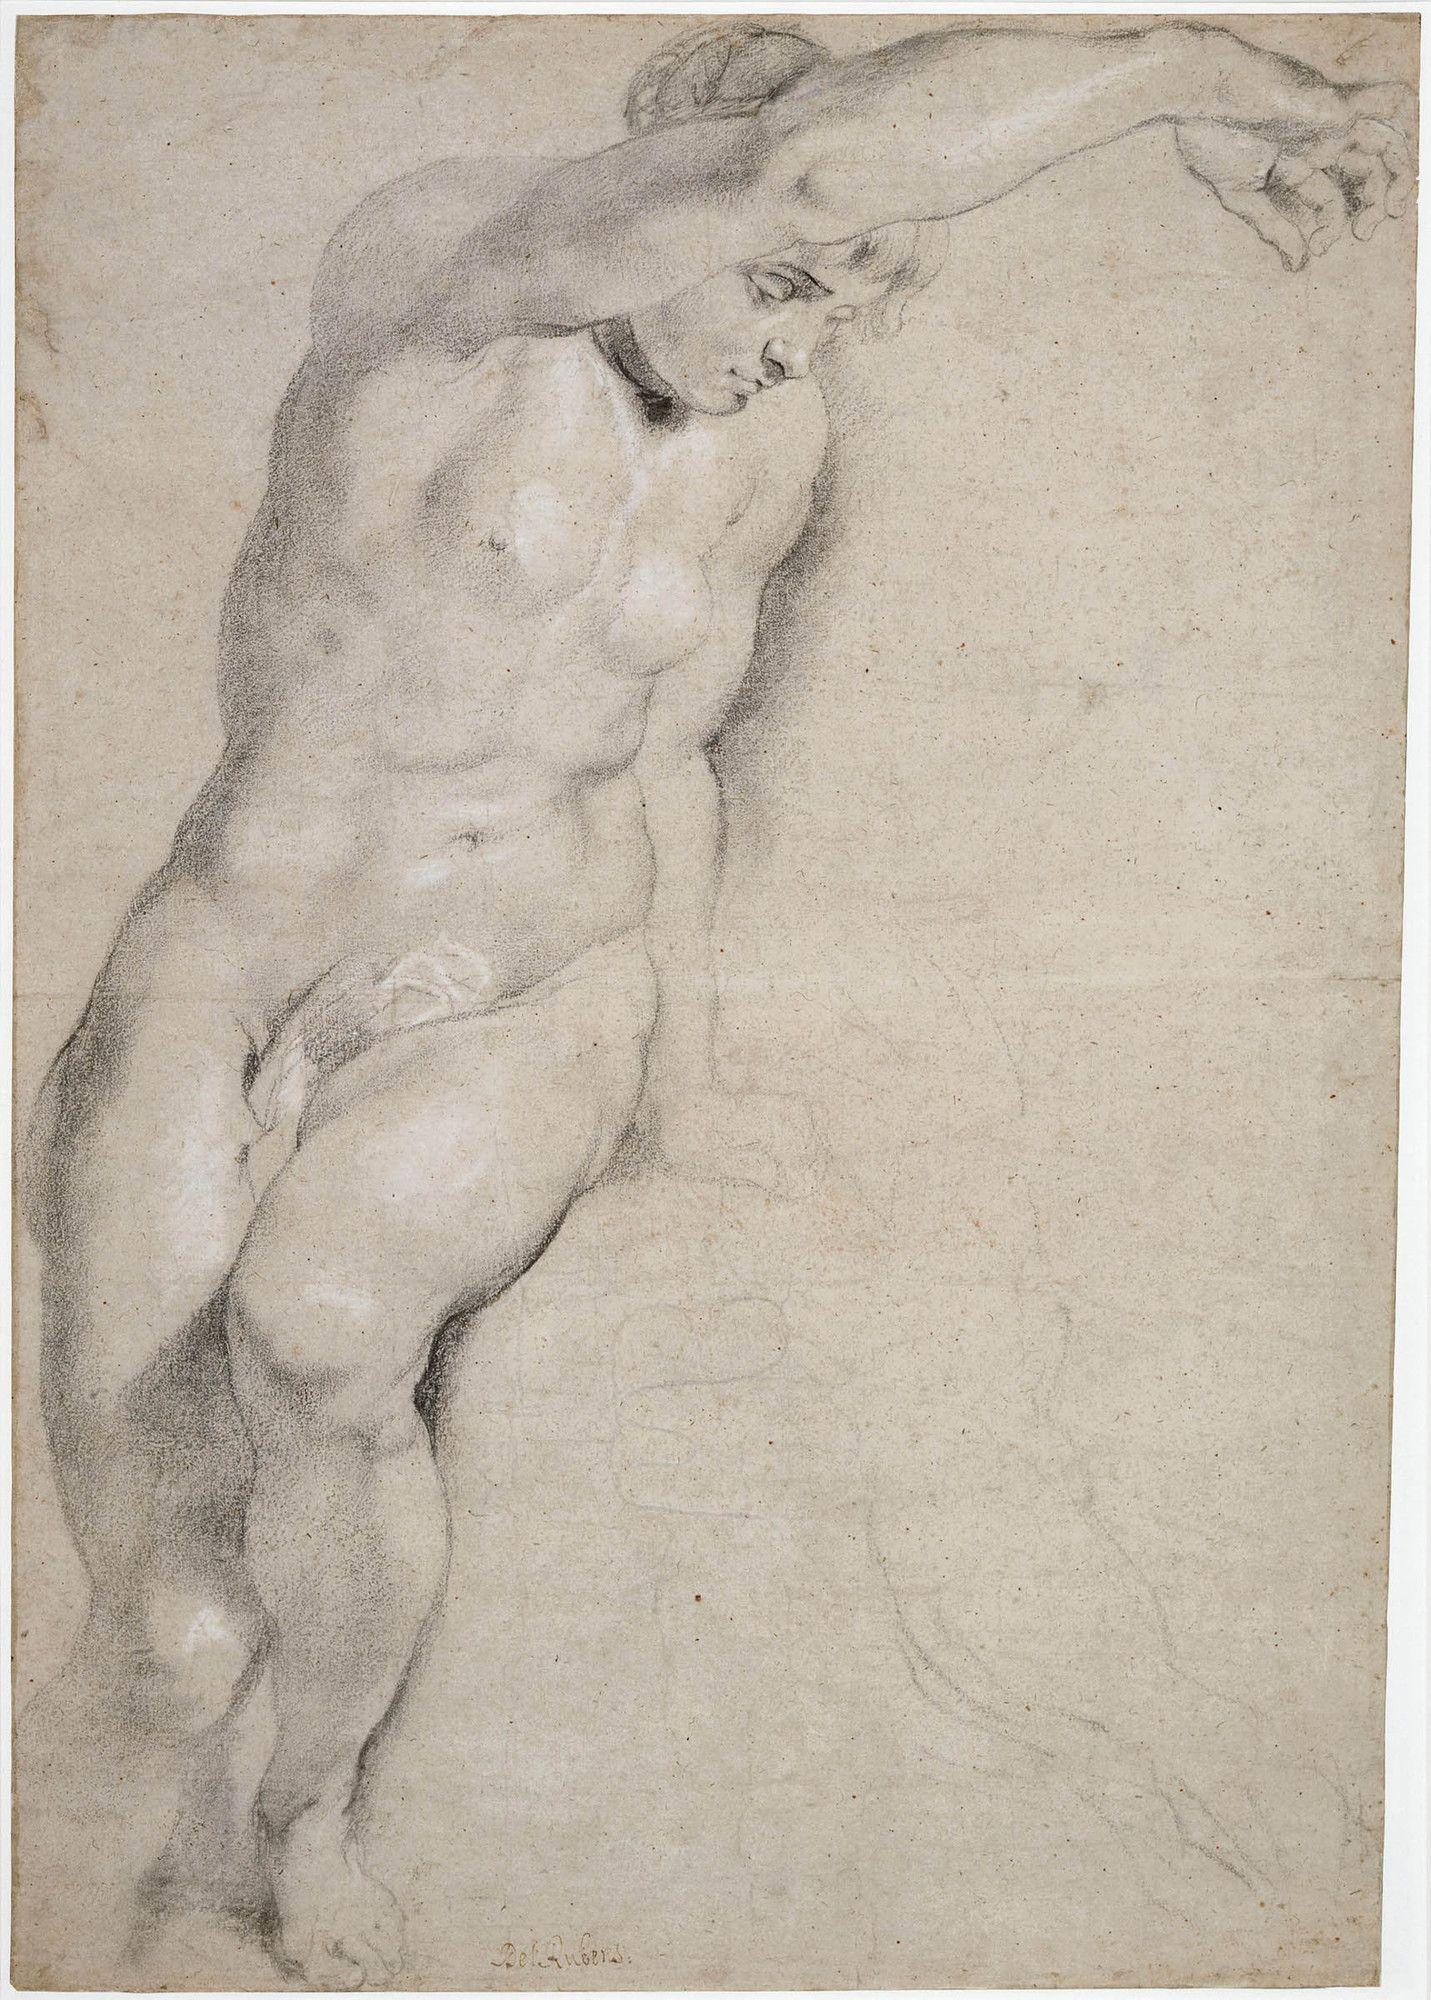 Peter Paul Rubens Drawings | draw | Pinterest | Anatomía, Dibujo y ...